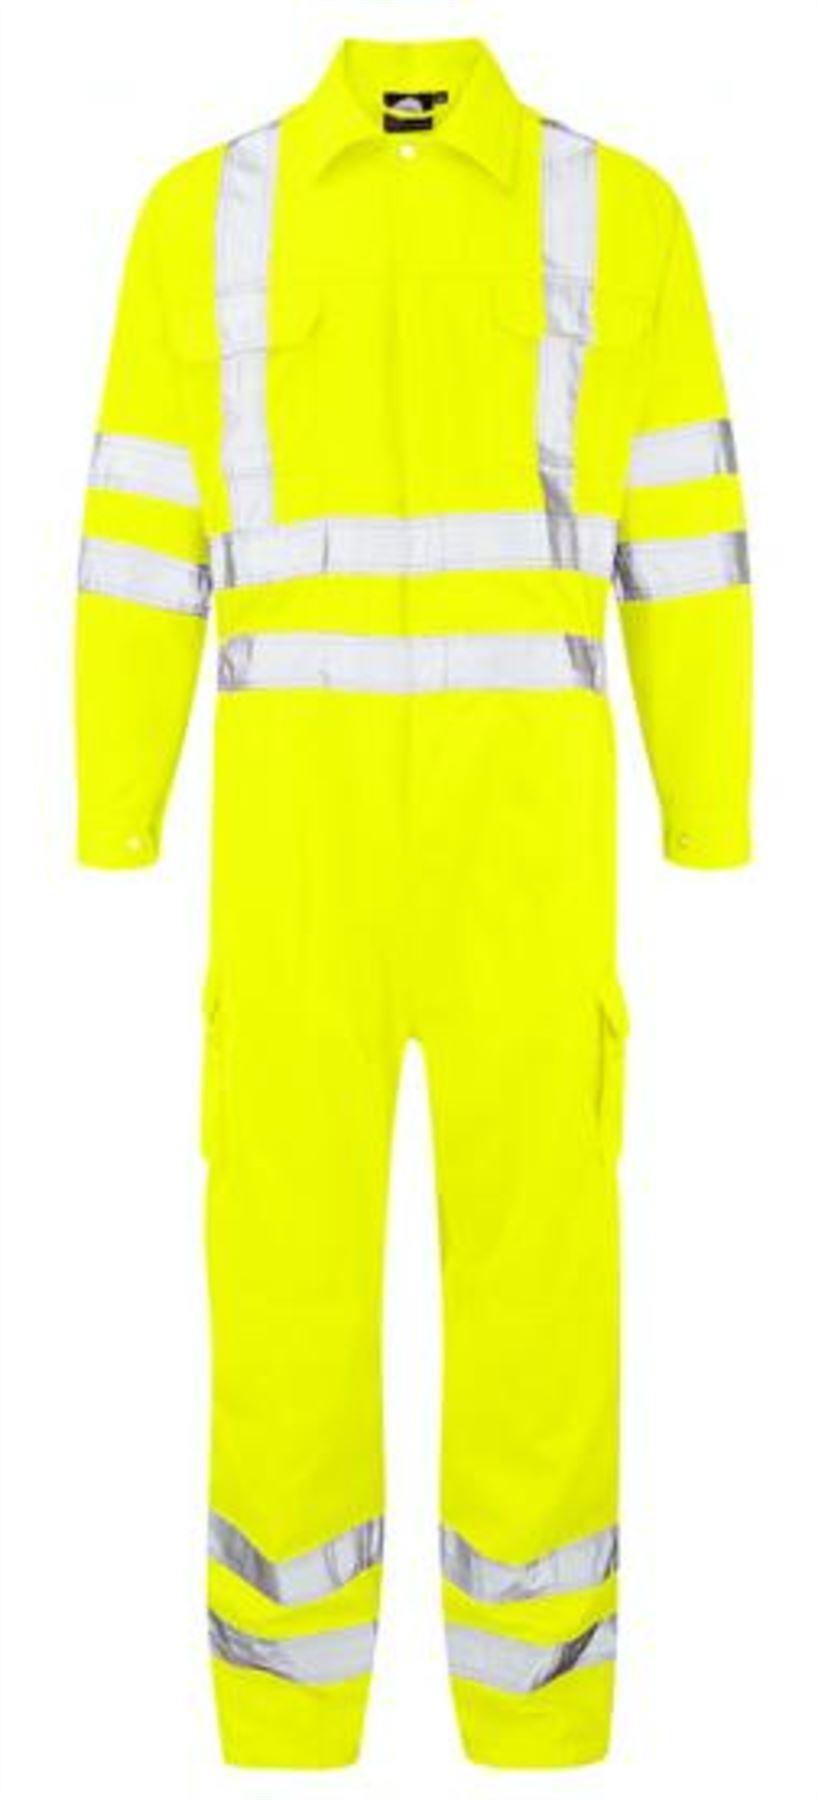 Orn Shrike Hi Vis Overall - Yellow 5XL35L